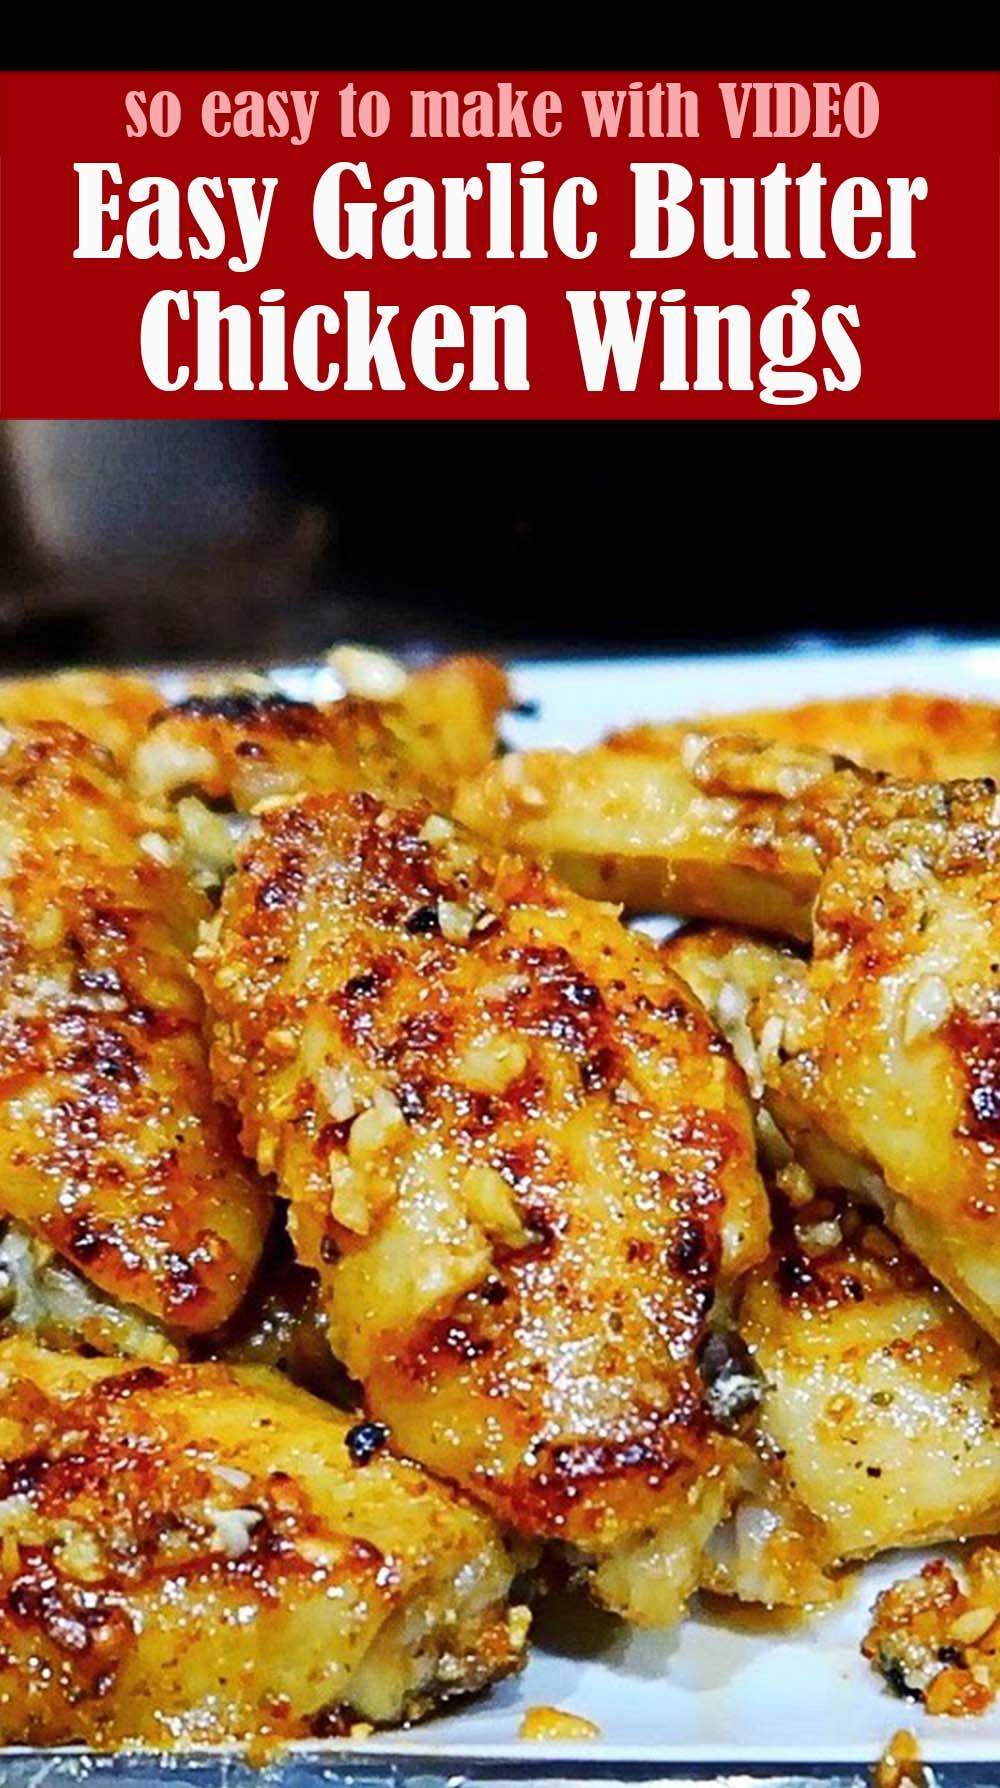 Easy Garlic Butter Chicken Wings